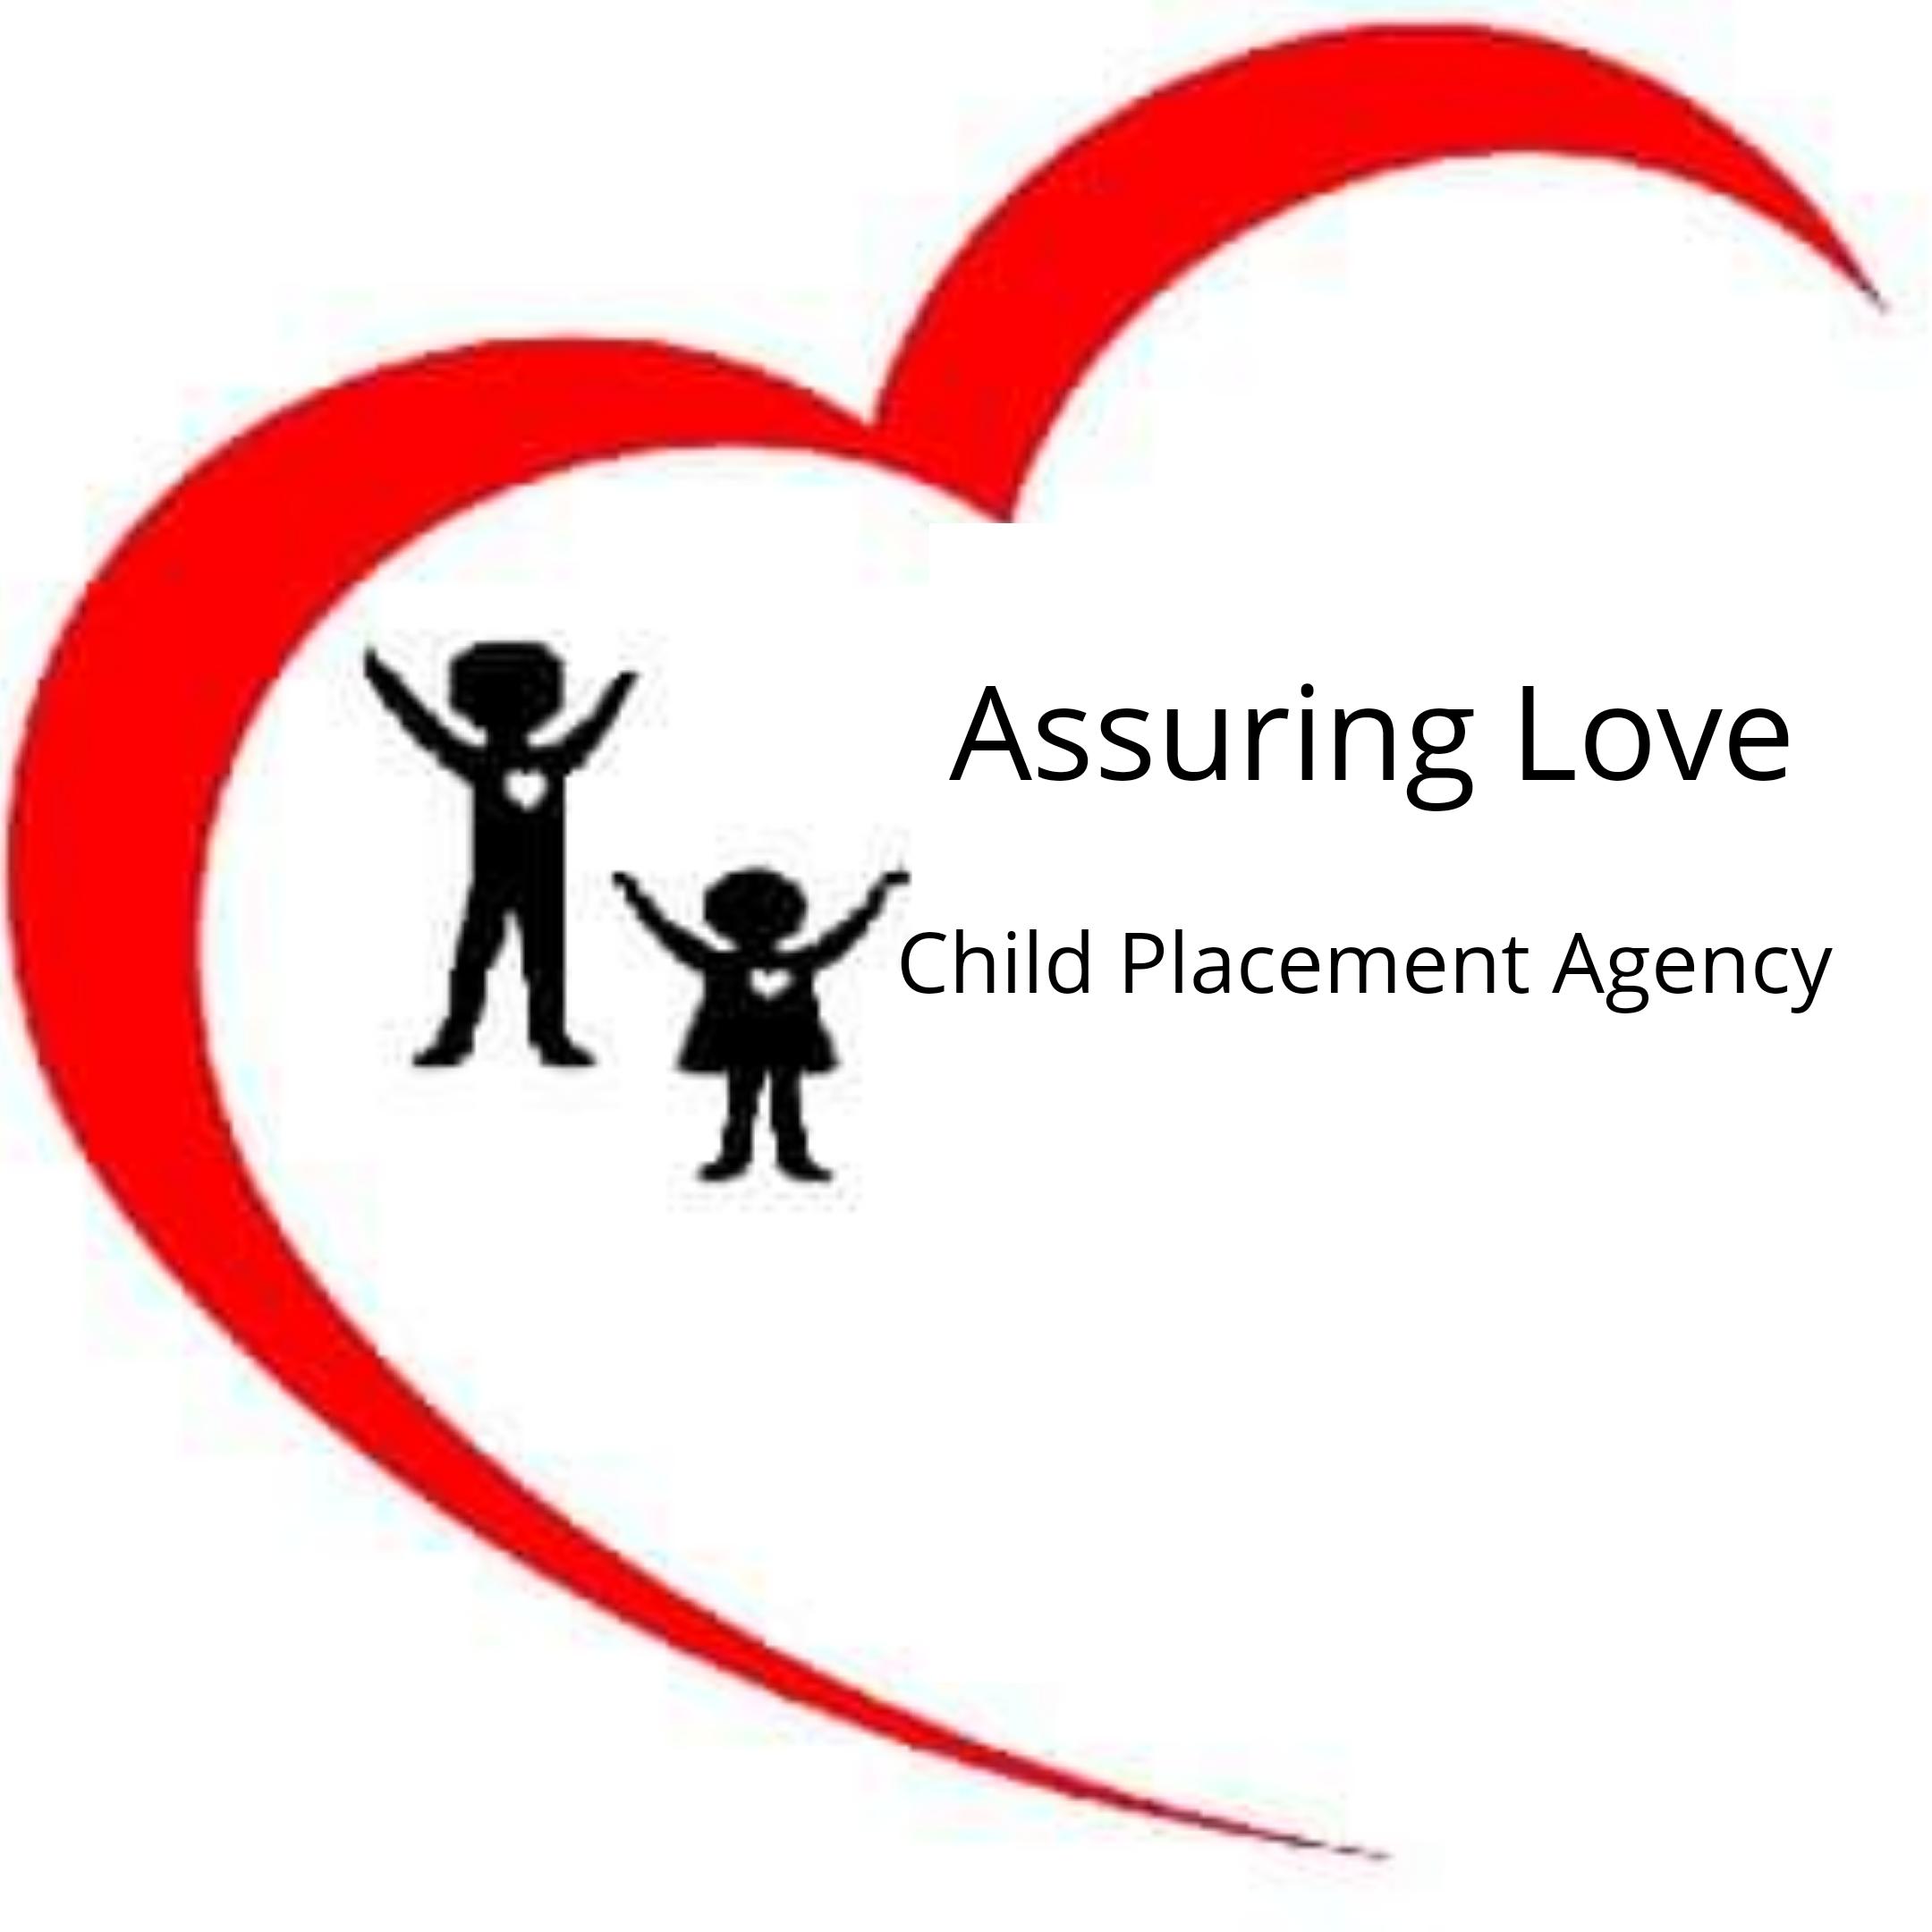 Assuring Love